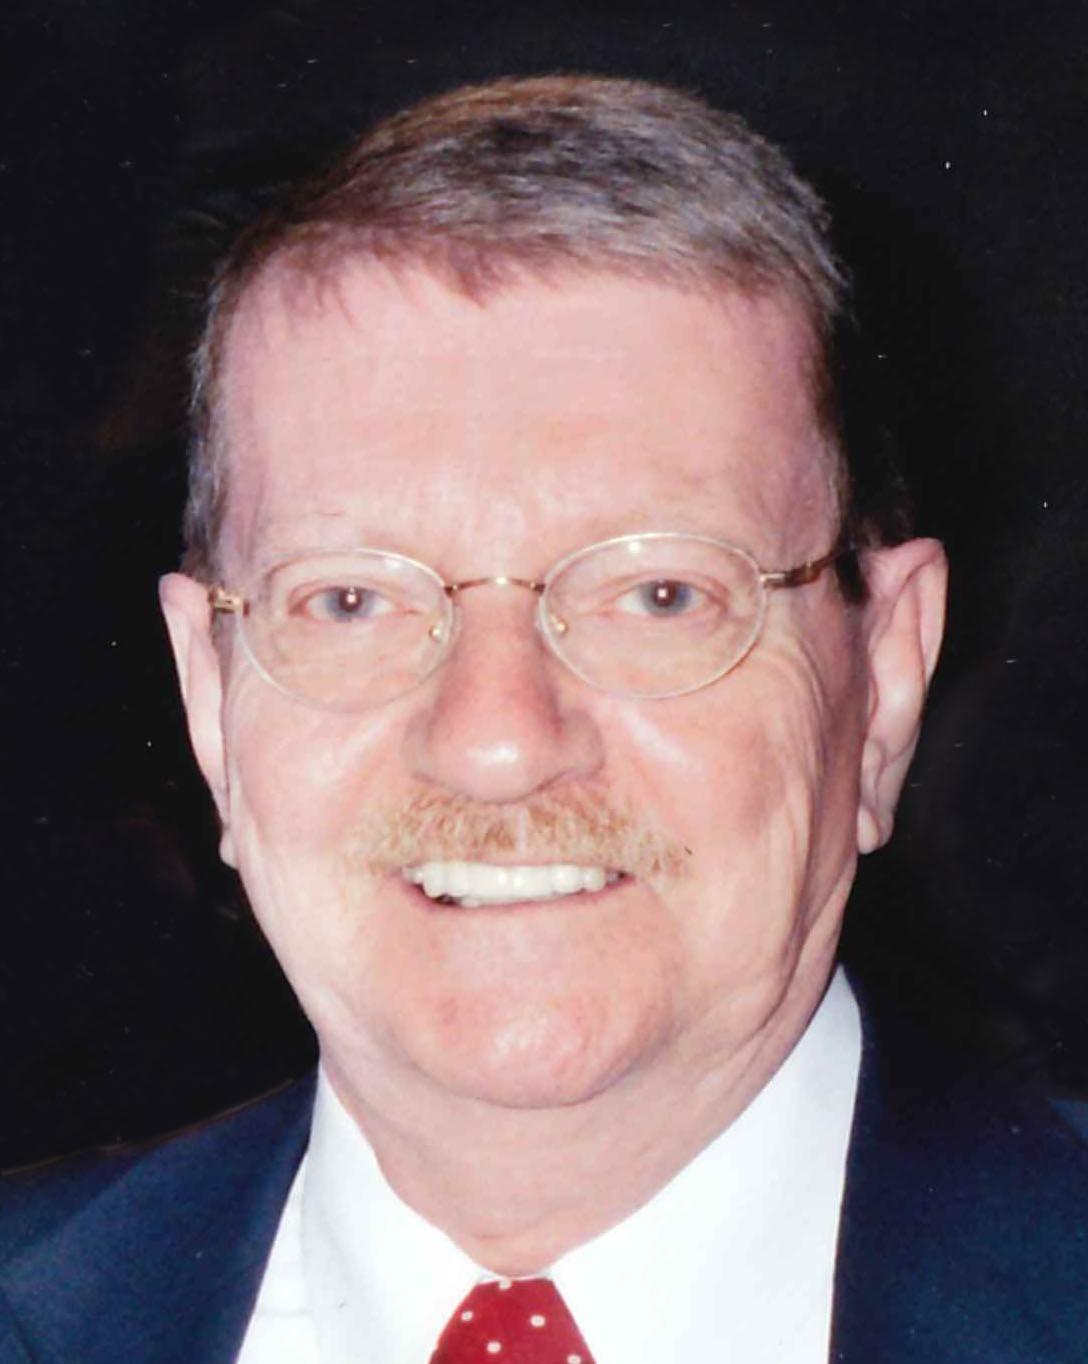 Rodney Wayne Johnson, 73 years of age, of Kearney, Nebraska, formerly of Holdrege, and the Denver, Colorado area